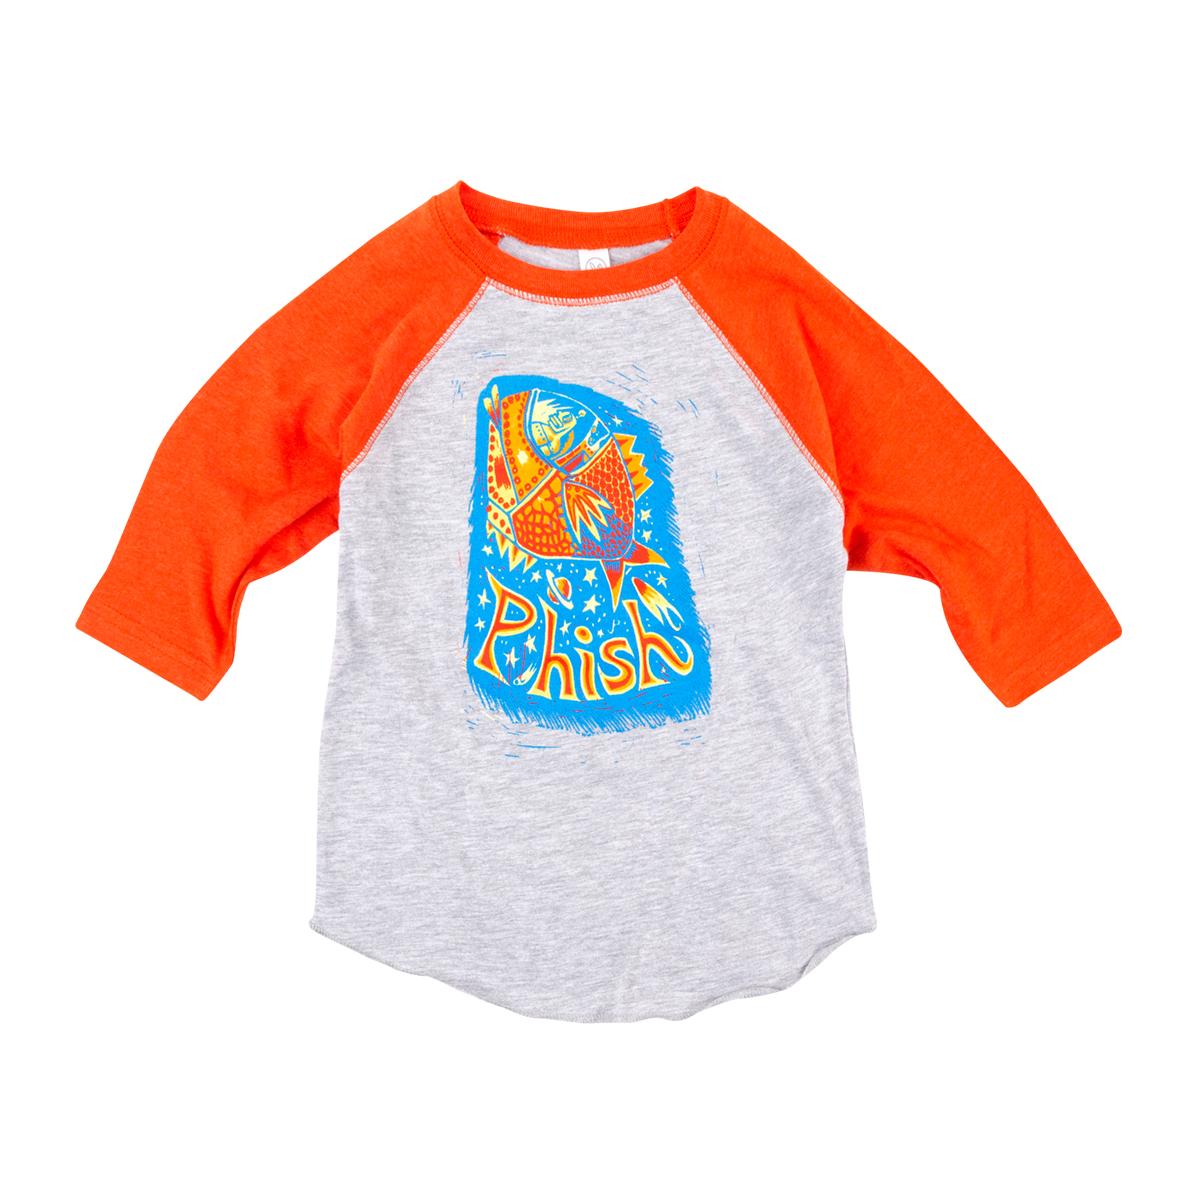 Pollock Rocket Baseball Sleeve Toddler Tee